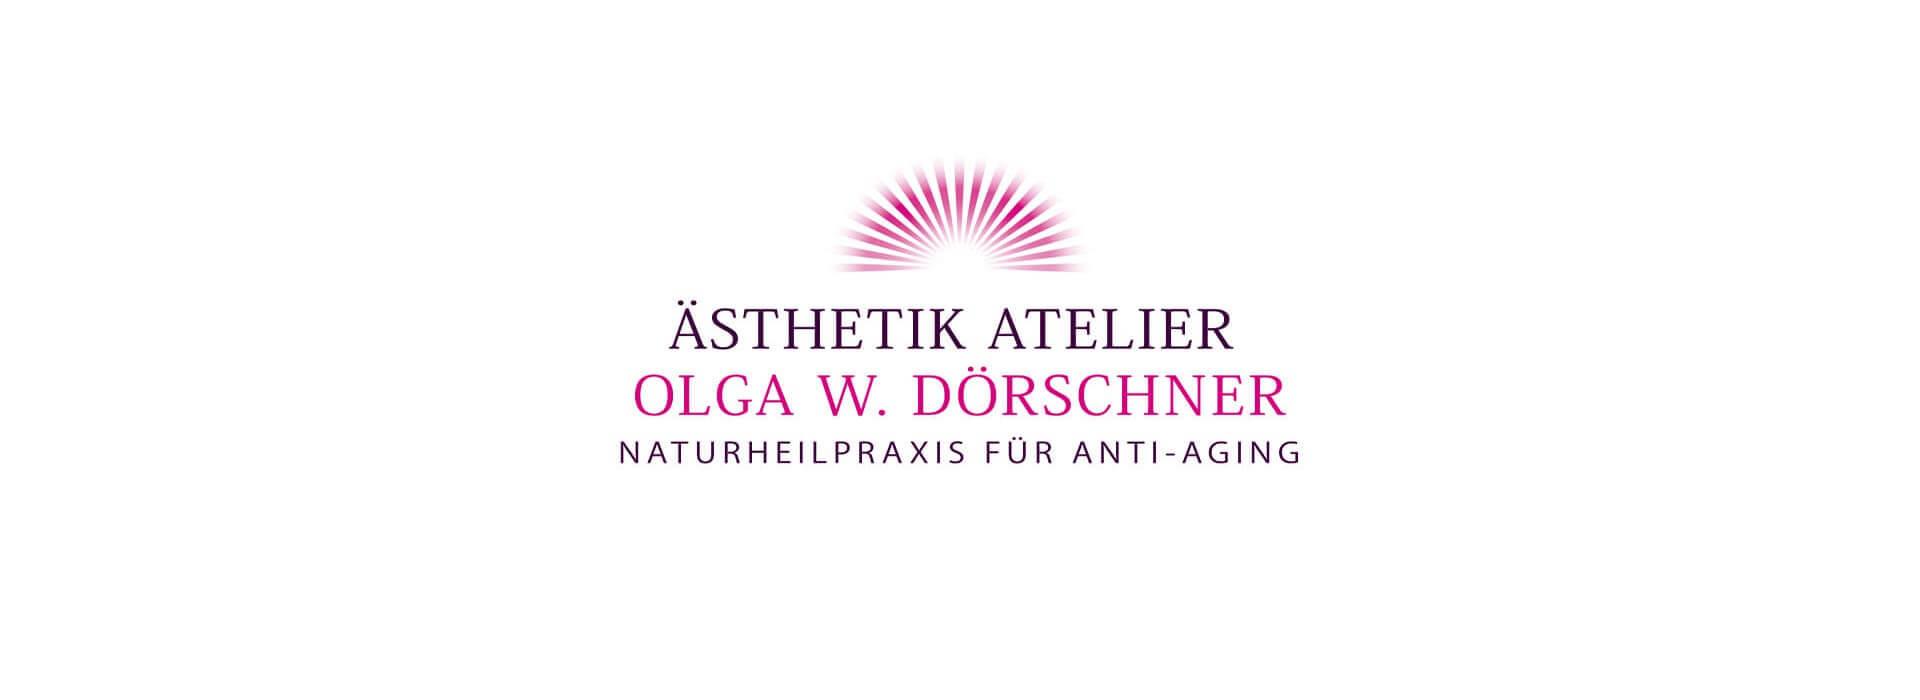 Faltenbehandlung Nürnberg Ästhetik Atelier Dörschner Logo